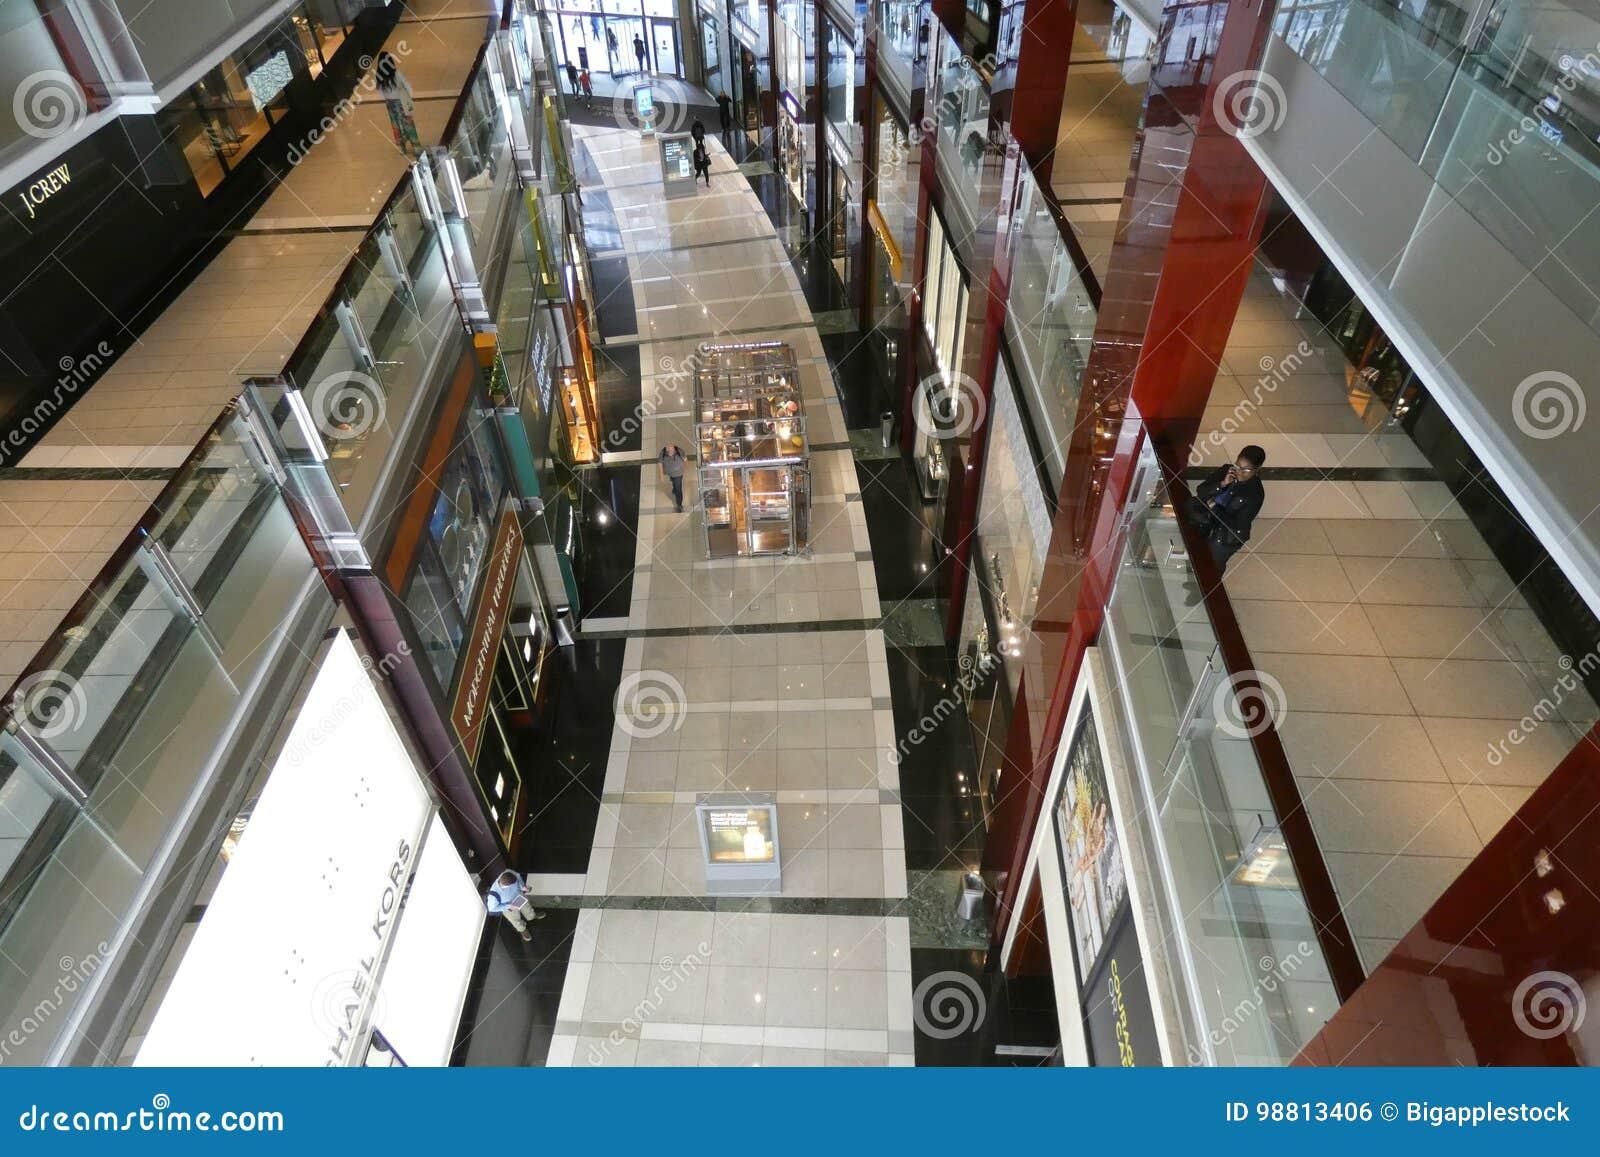 New York City Mall